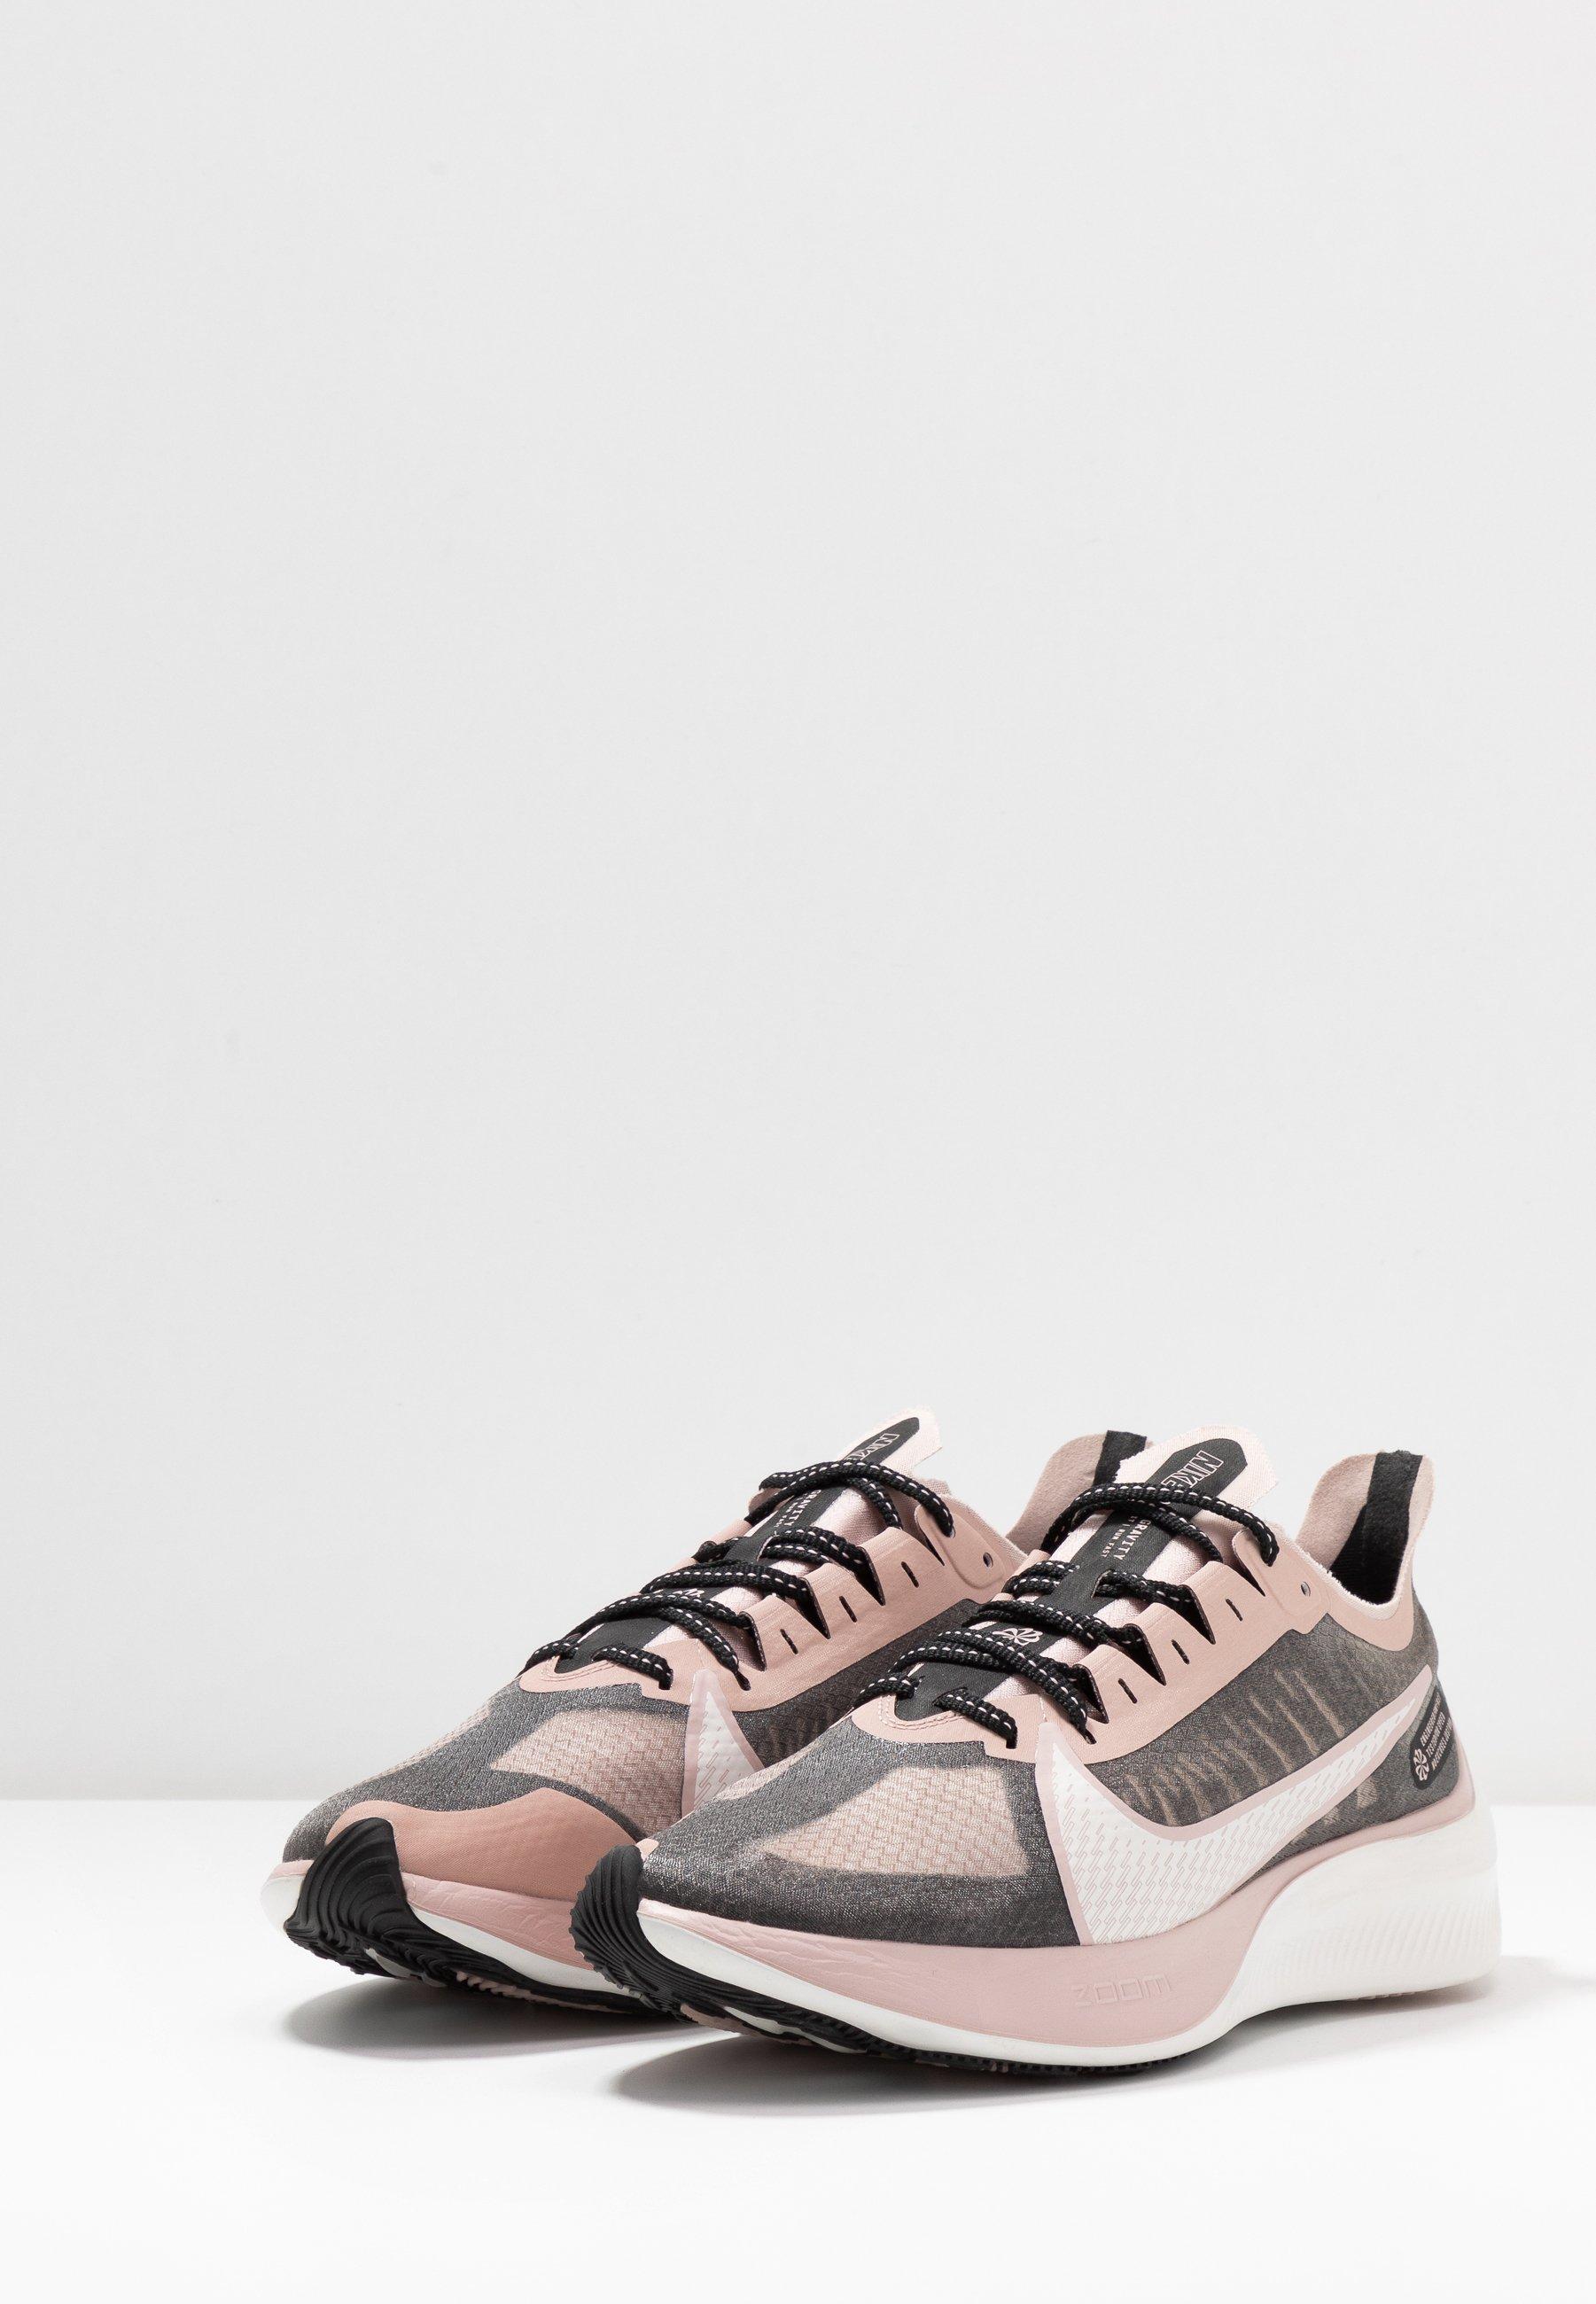 Nike Performance Zoom Gravity - Hardloopschoenen Neutraal Black/platinum Tint/stone Mauve/metallicred Bronze/smokey Mauve Goedkope Schoenen